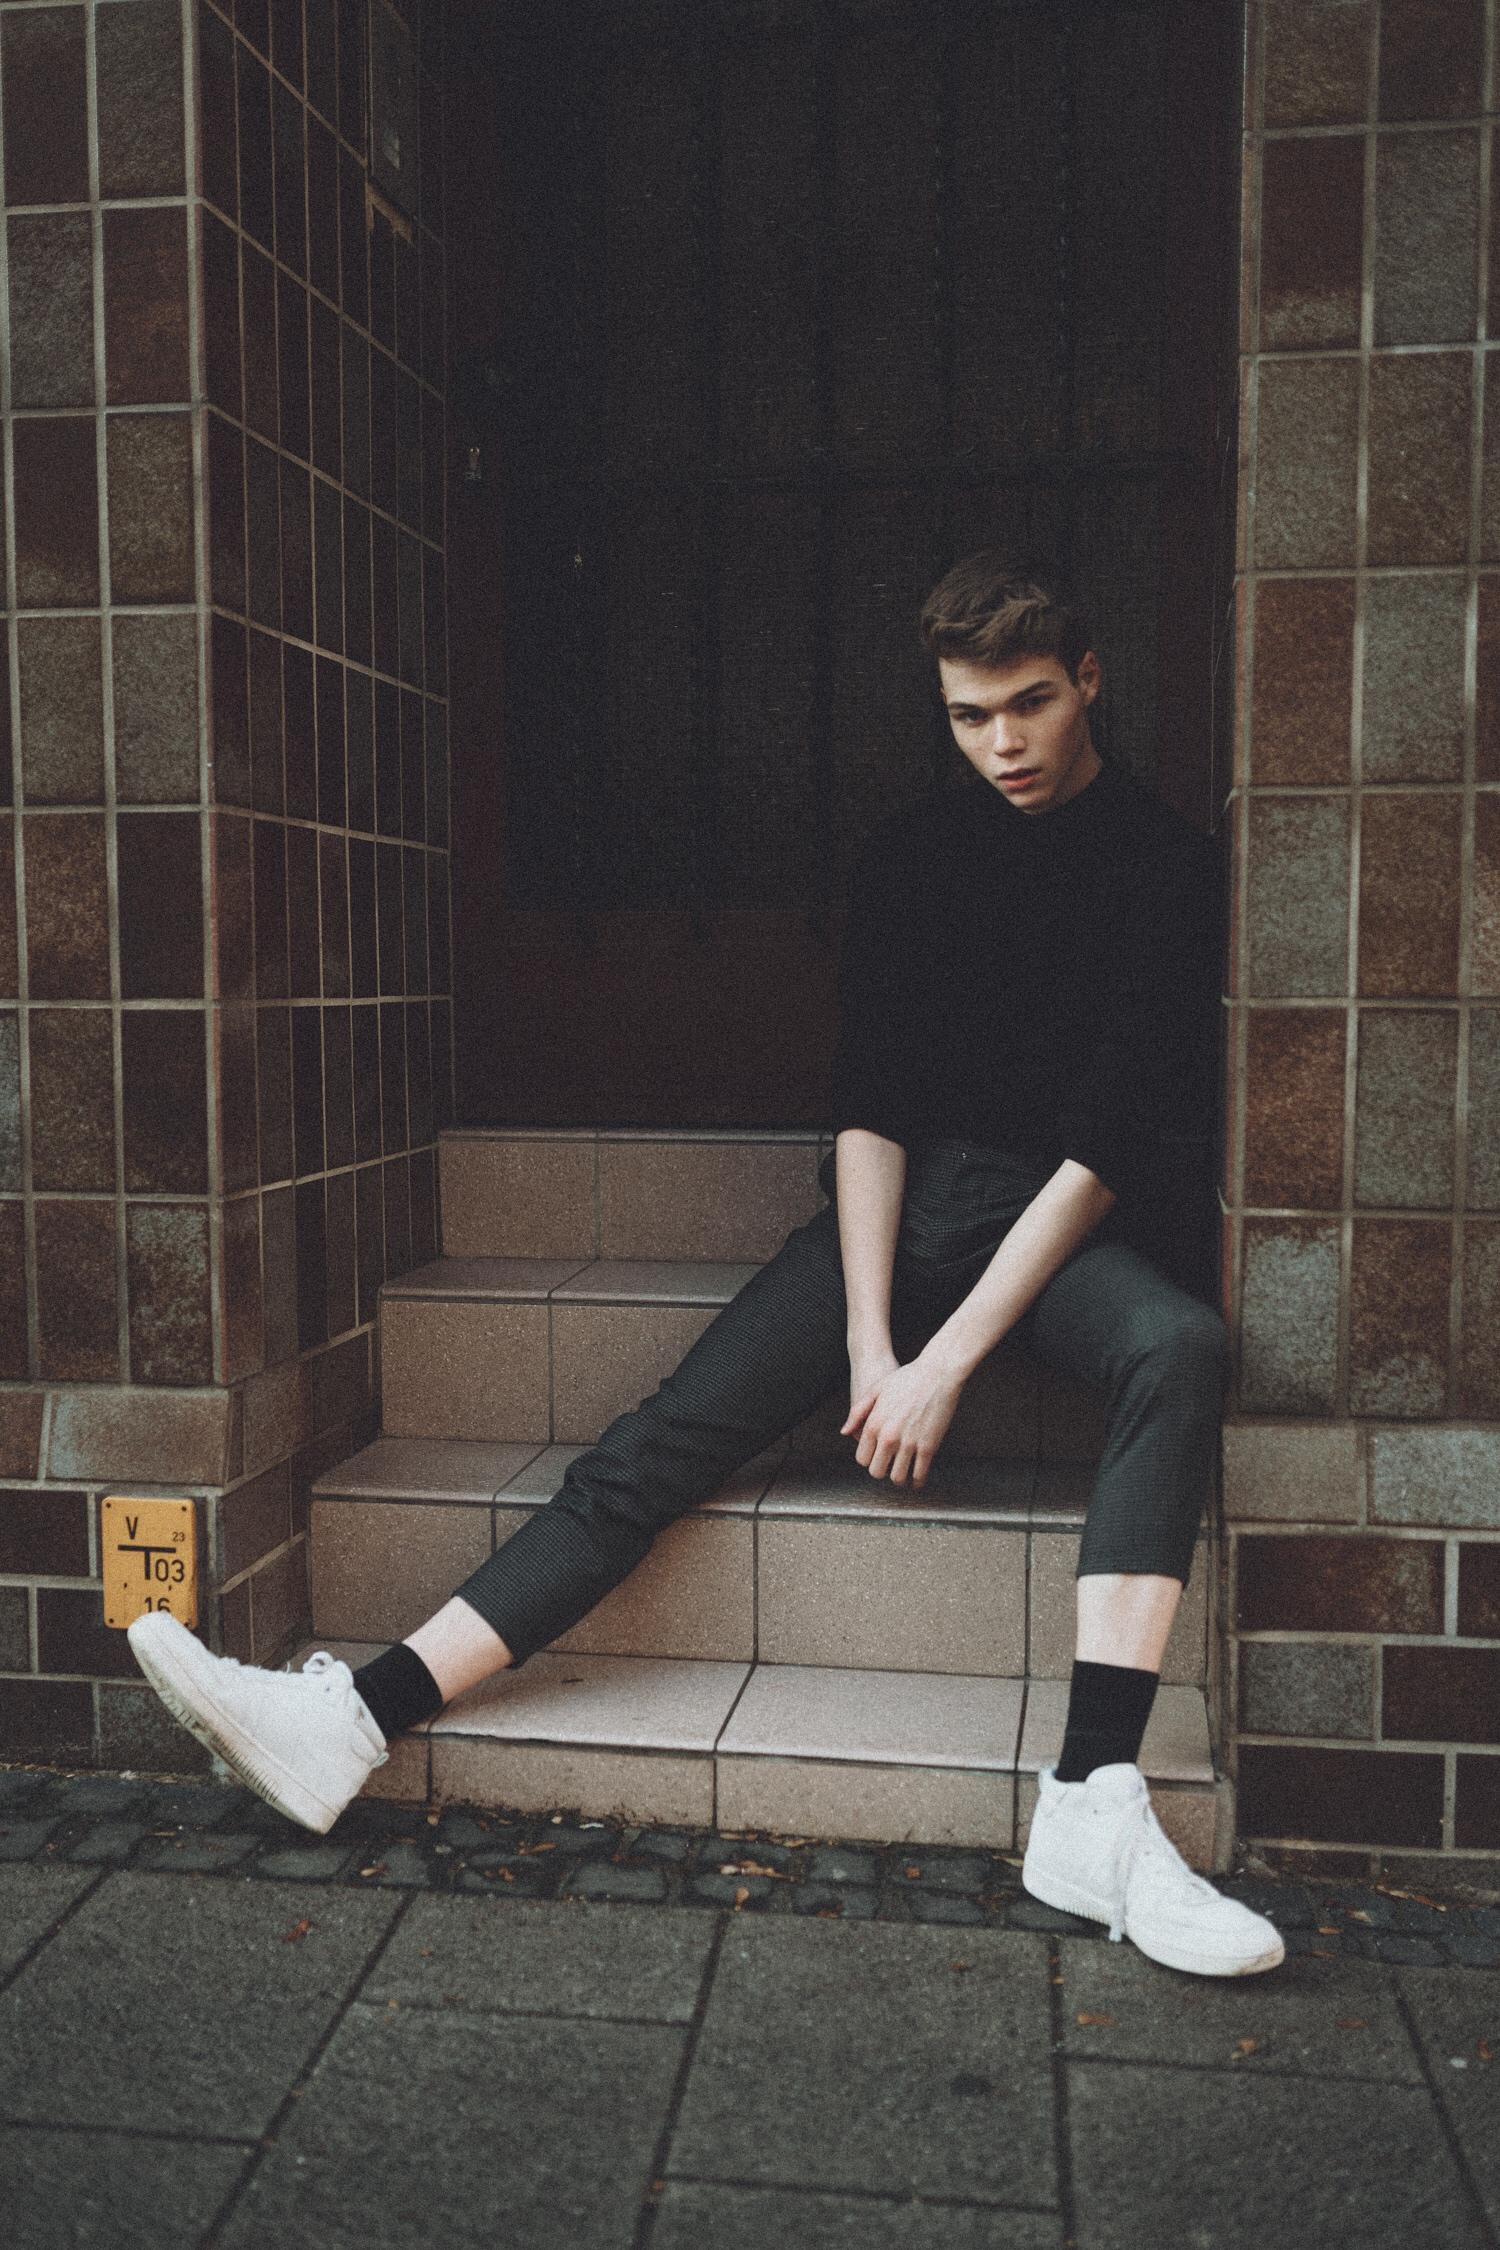 Leon-E-ncmodelscoting-Daniel-Spiecker (13).jpeg